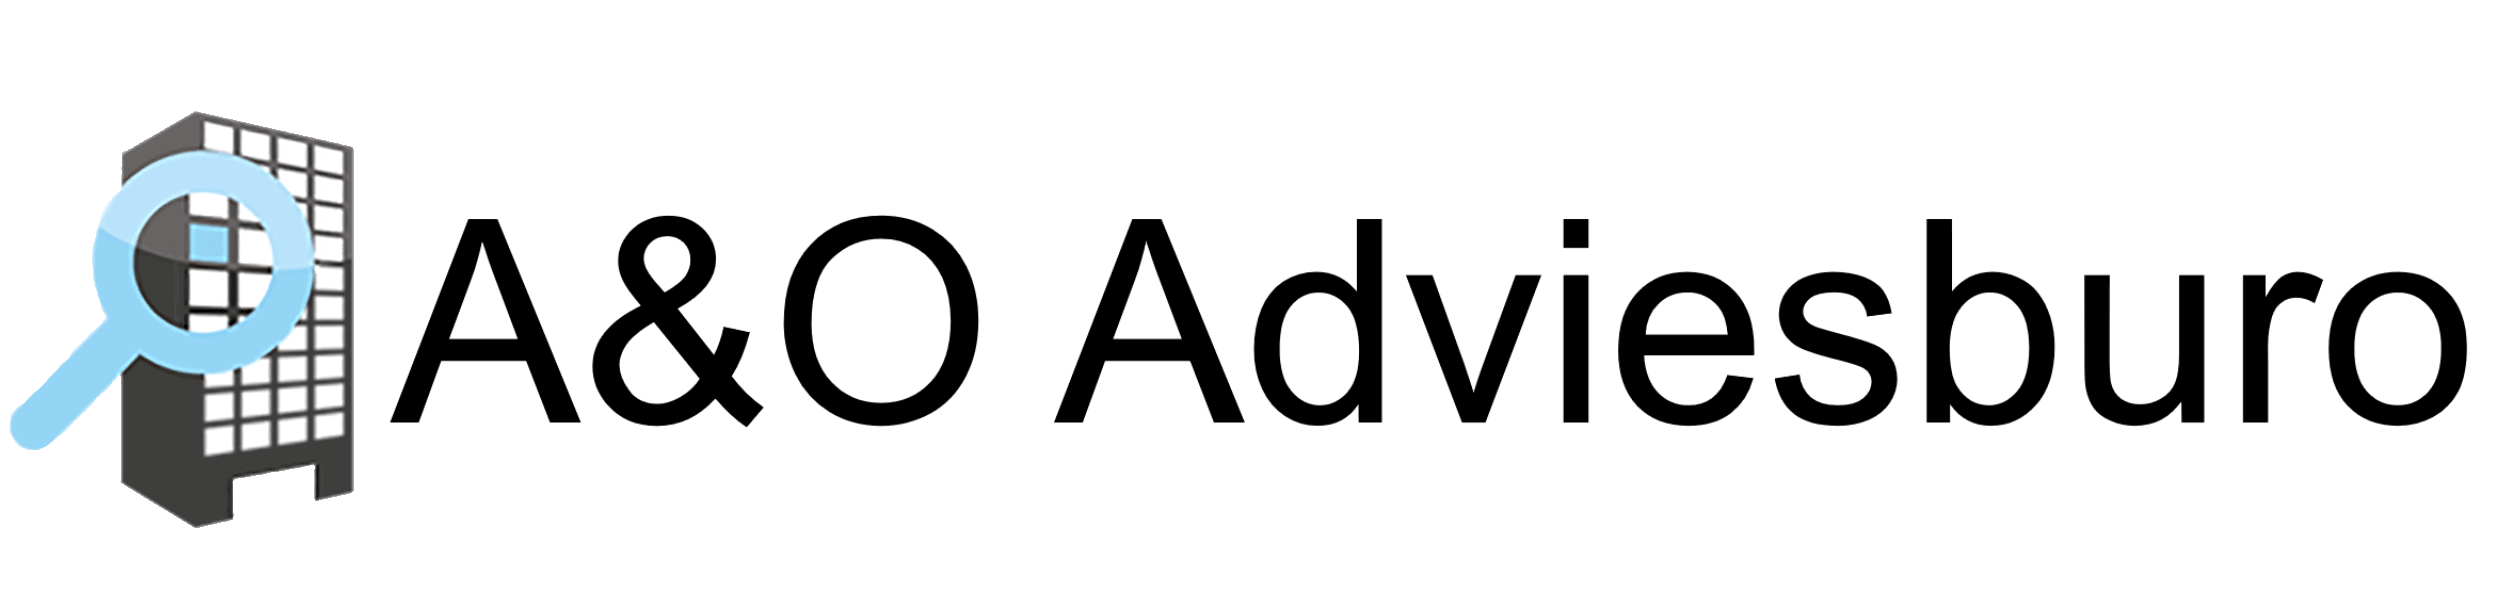 headerblacklogo